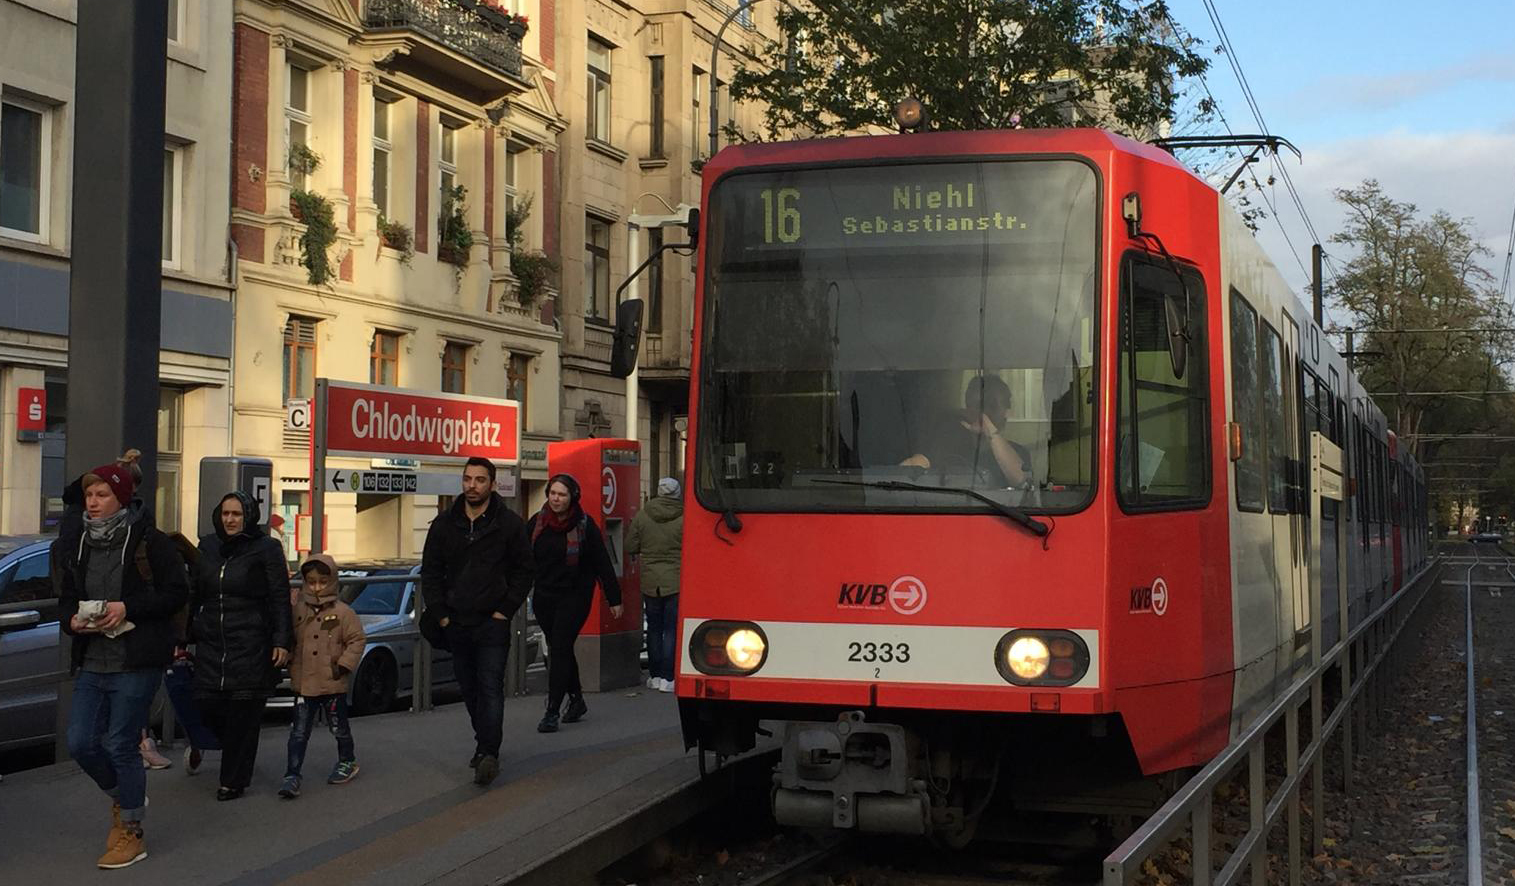 Köln Linie 16